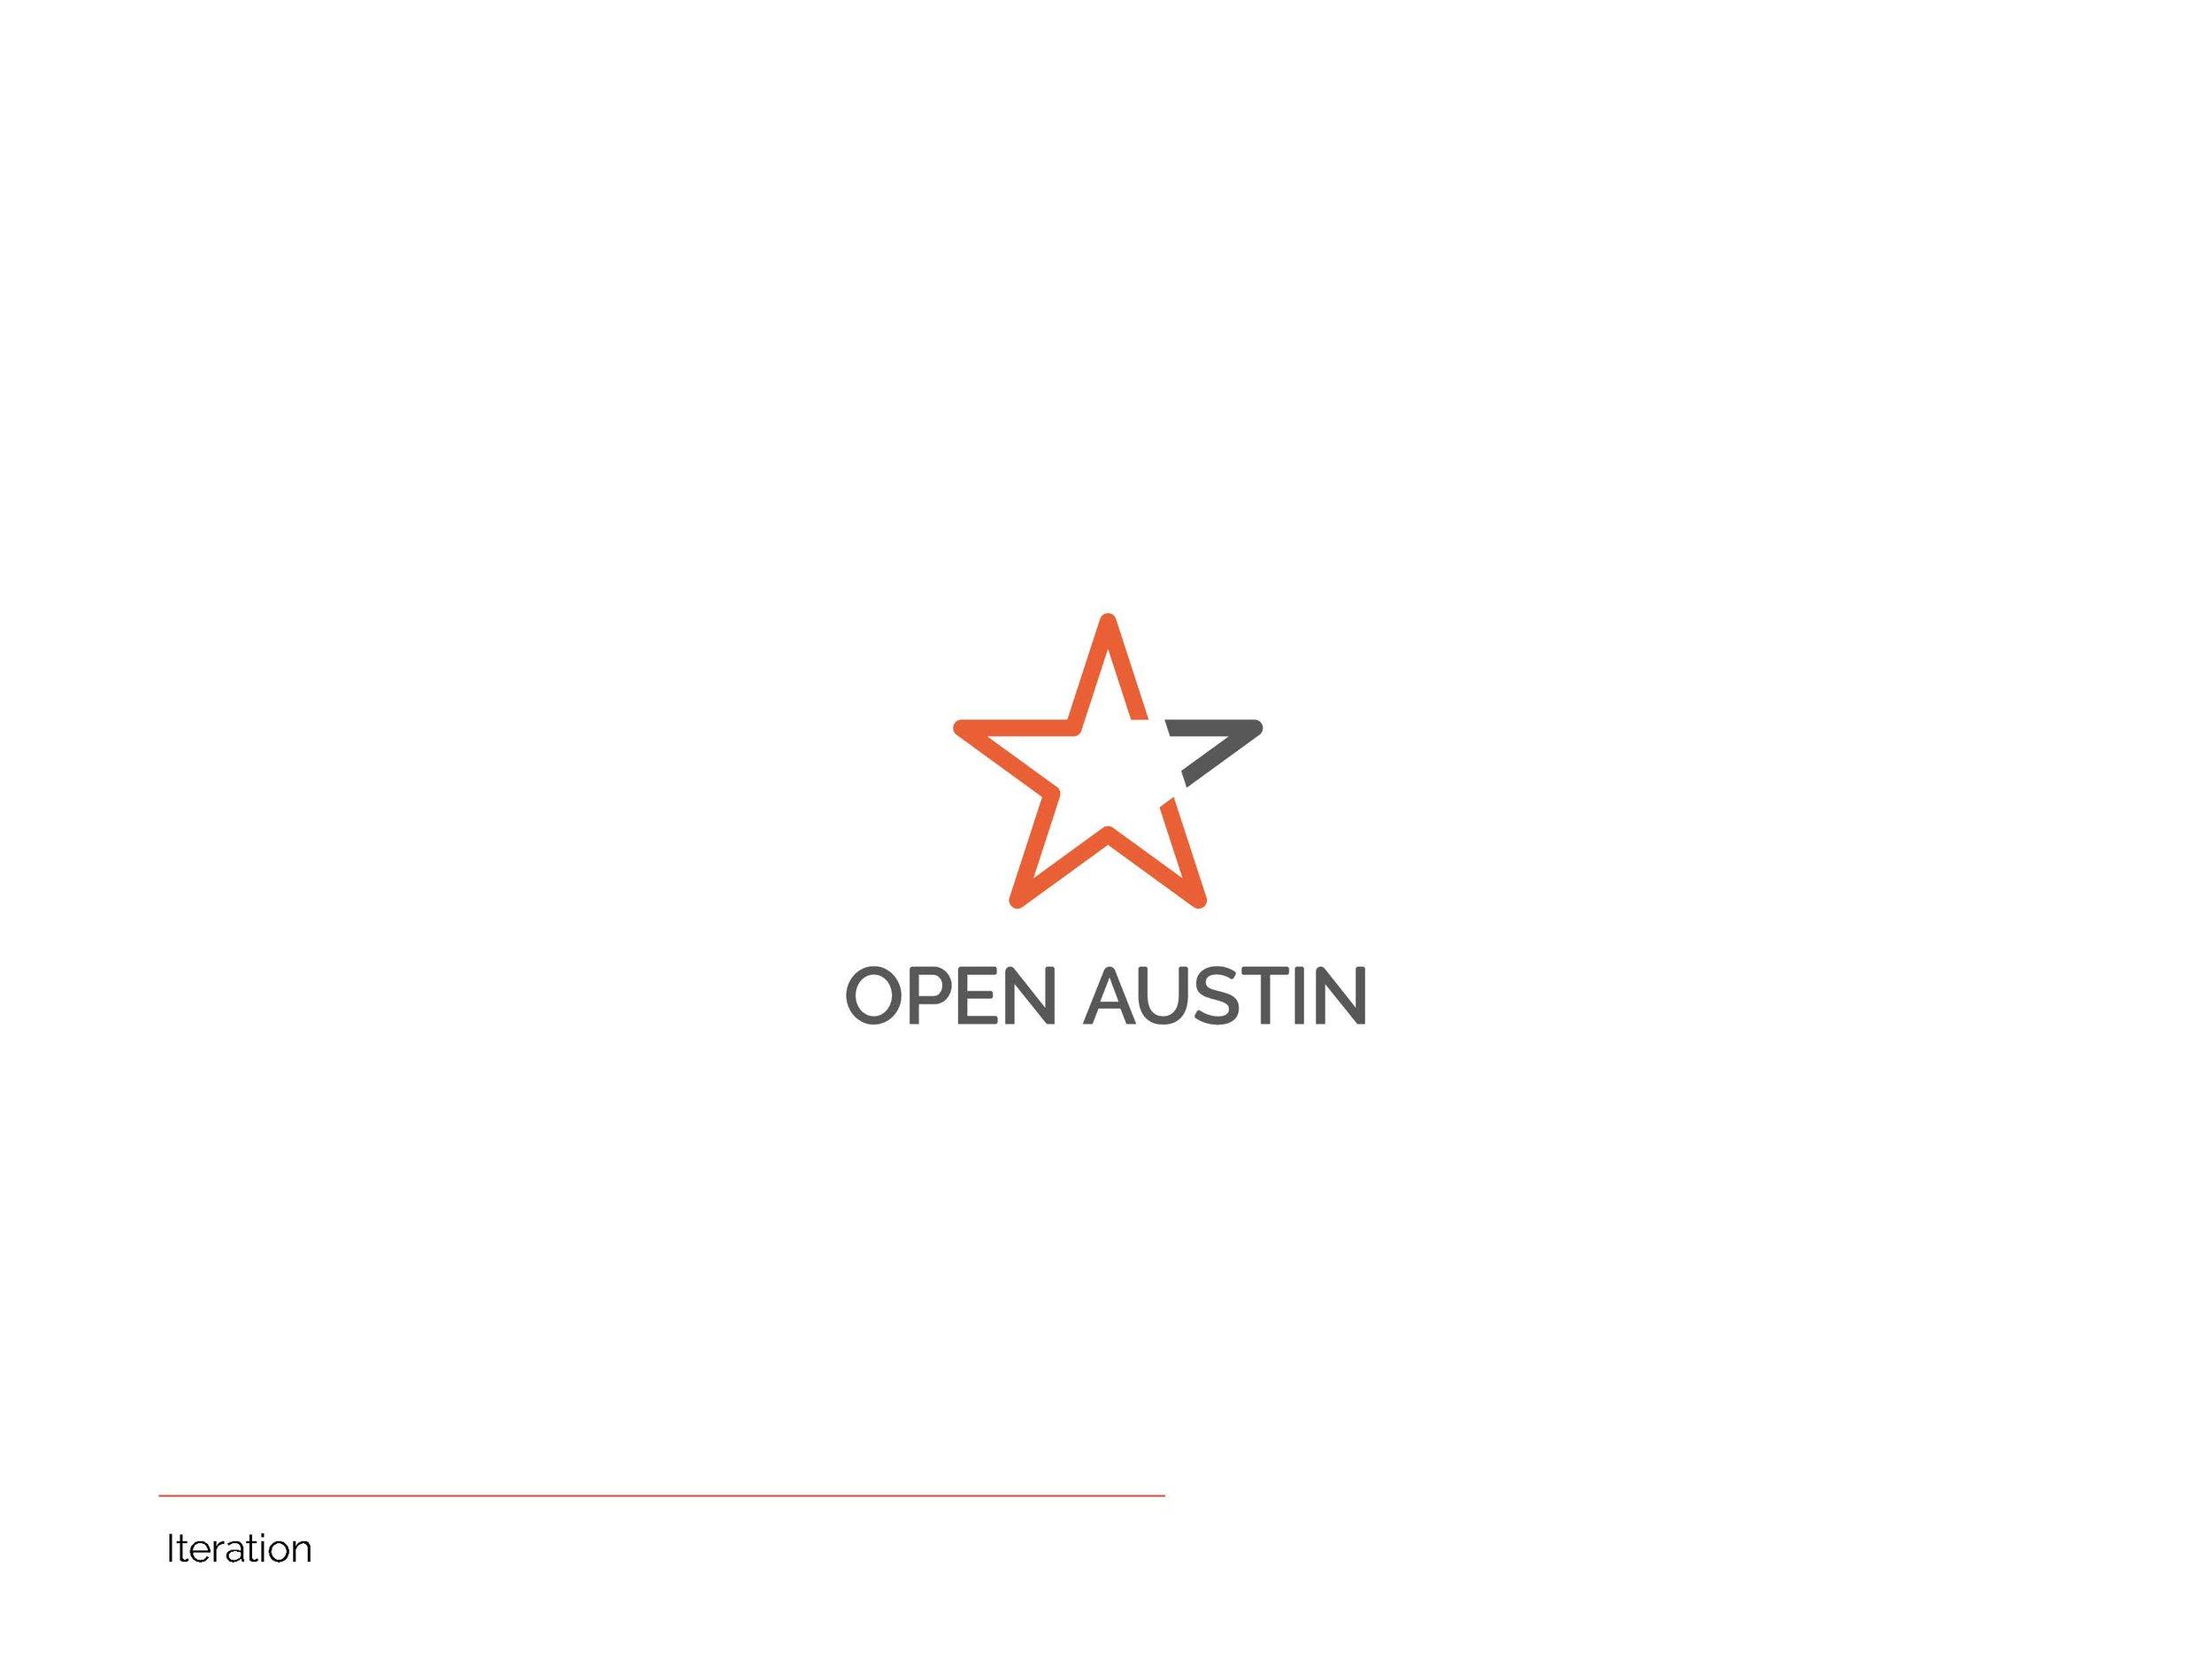 openaustinlogopresentation-160116162033_Page_13.jpg